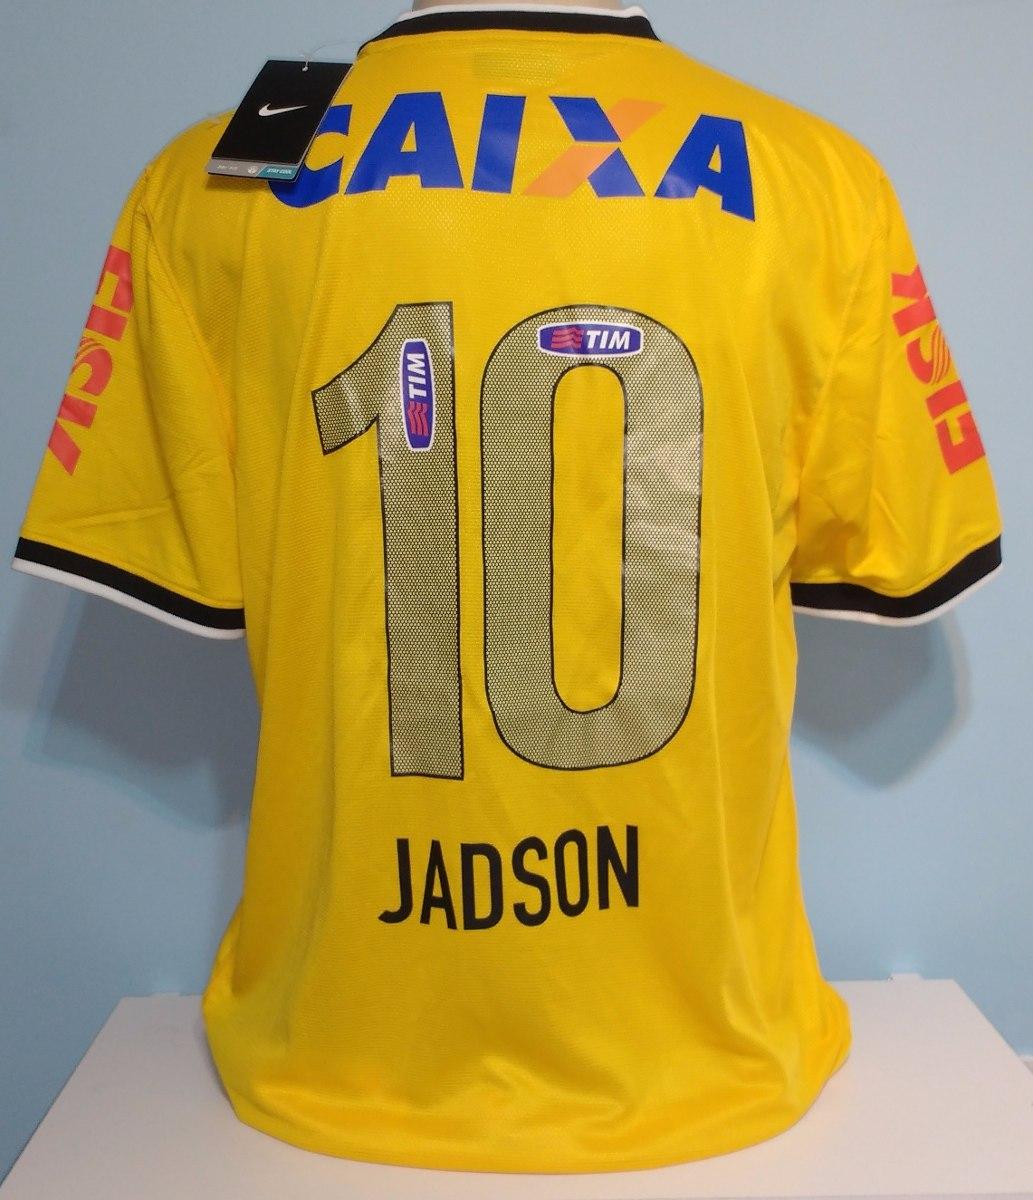 248f395706 camisa corinthians 2014 amarela jadson original nike. Carregando zoom.